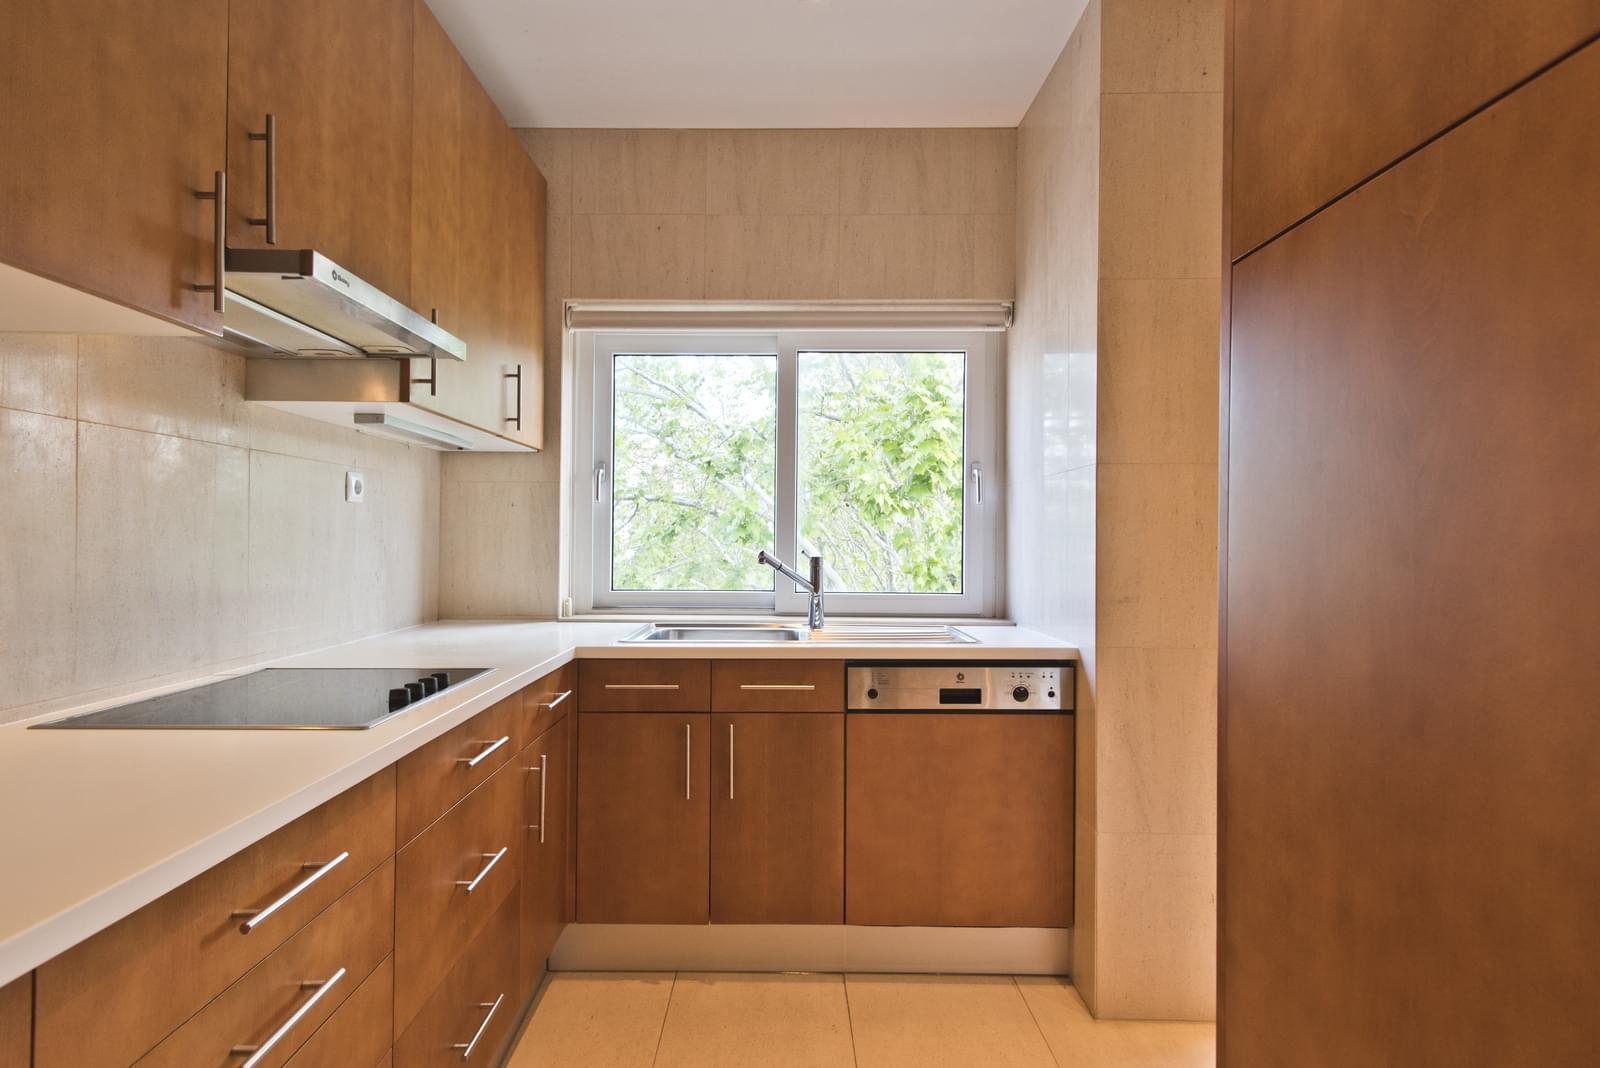 pf17006-apartamento-t1-cascais-3a4ea36d-5684-49ec-8bbd-7bfefa32bfca